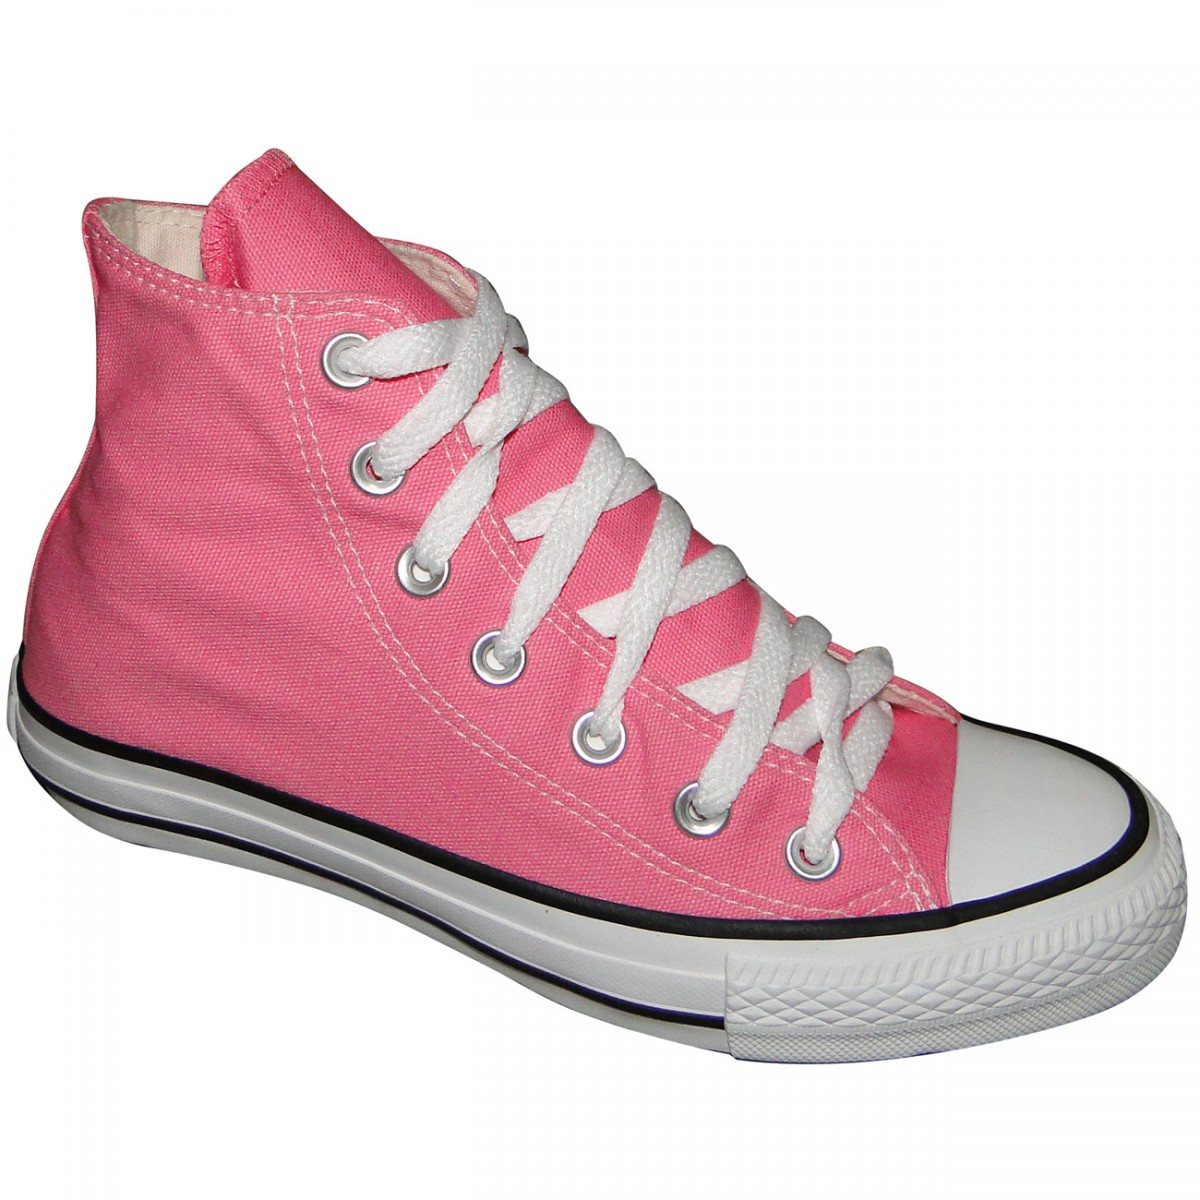 efe6655a56b BOTA ALL STAR CONVERSE CORE HI CT112007 - ROSA - Chuteira Nike ...